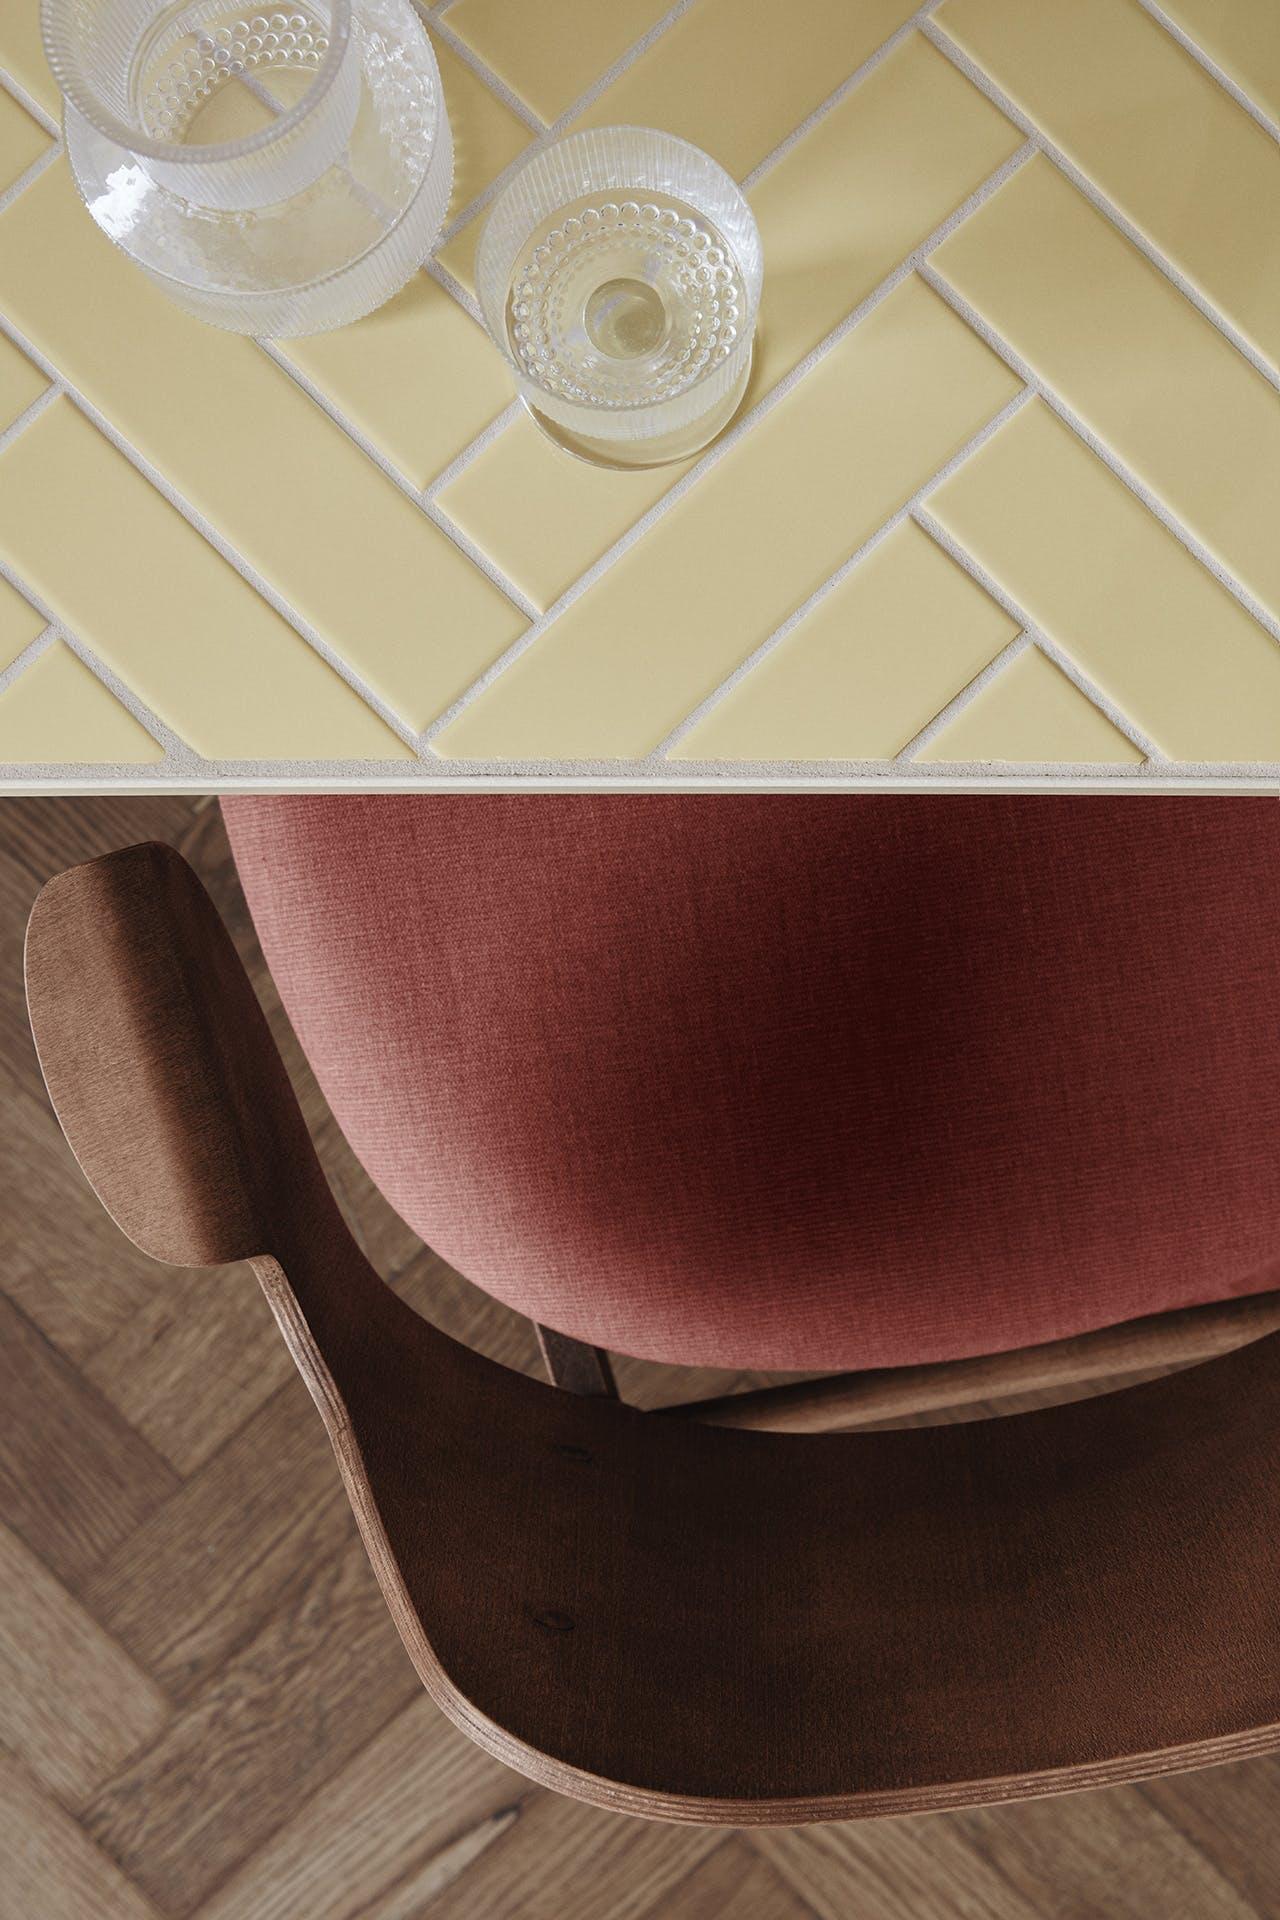 gesture chair herringbone tile warm nordic dansk design nyt brand